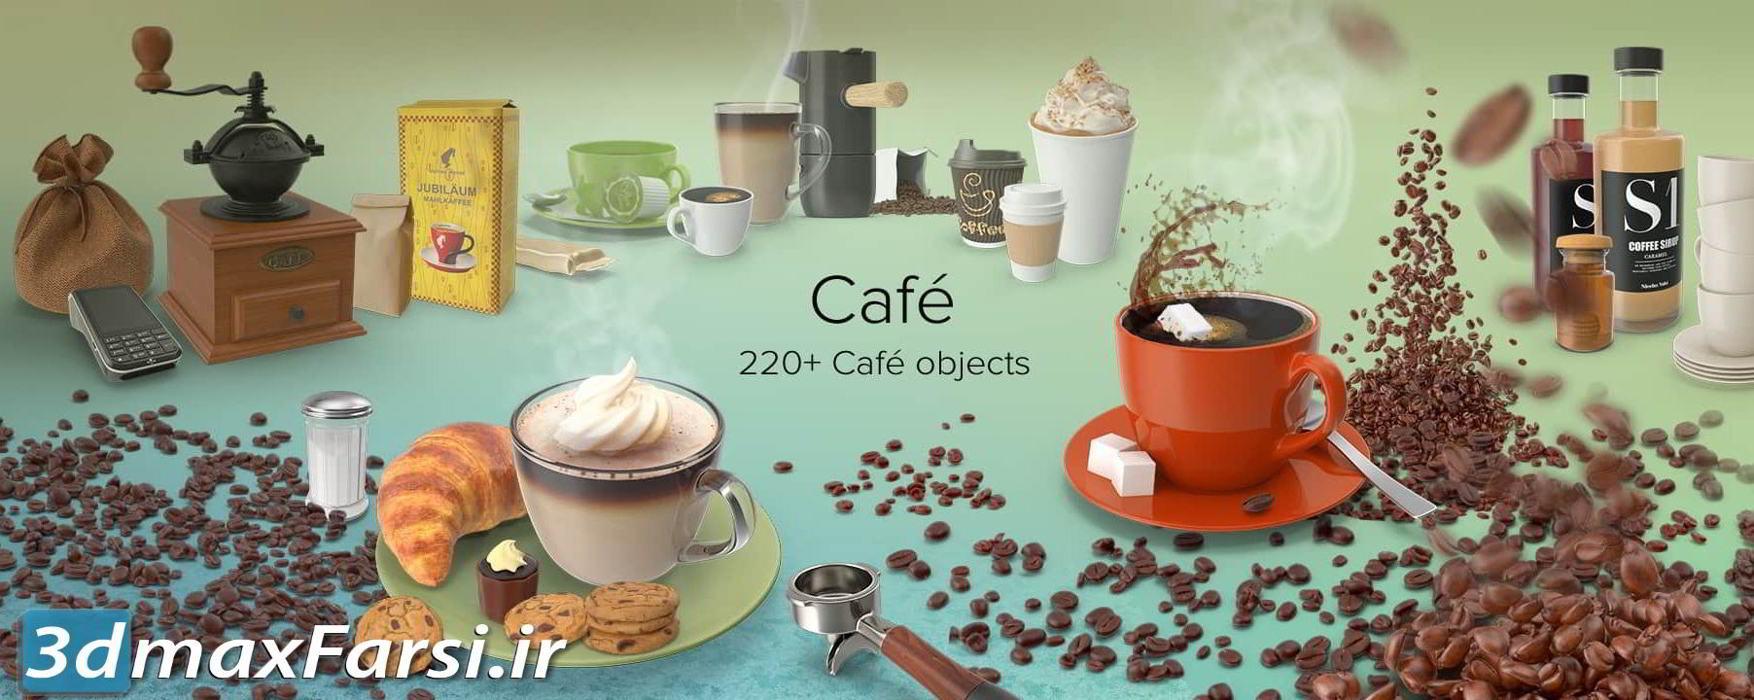 دانلود تصاویر گرافیکی کافی شاپ PixelSquid – Cafe Collection